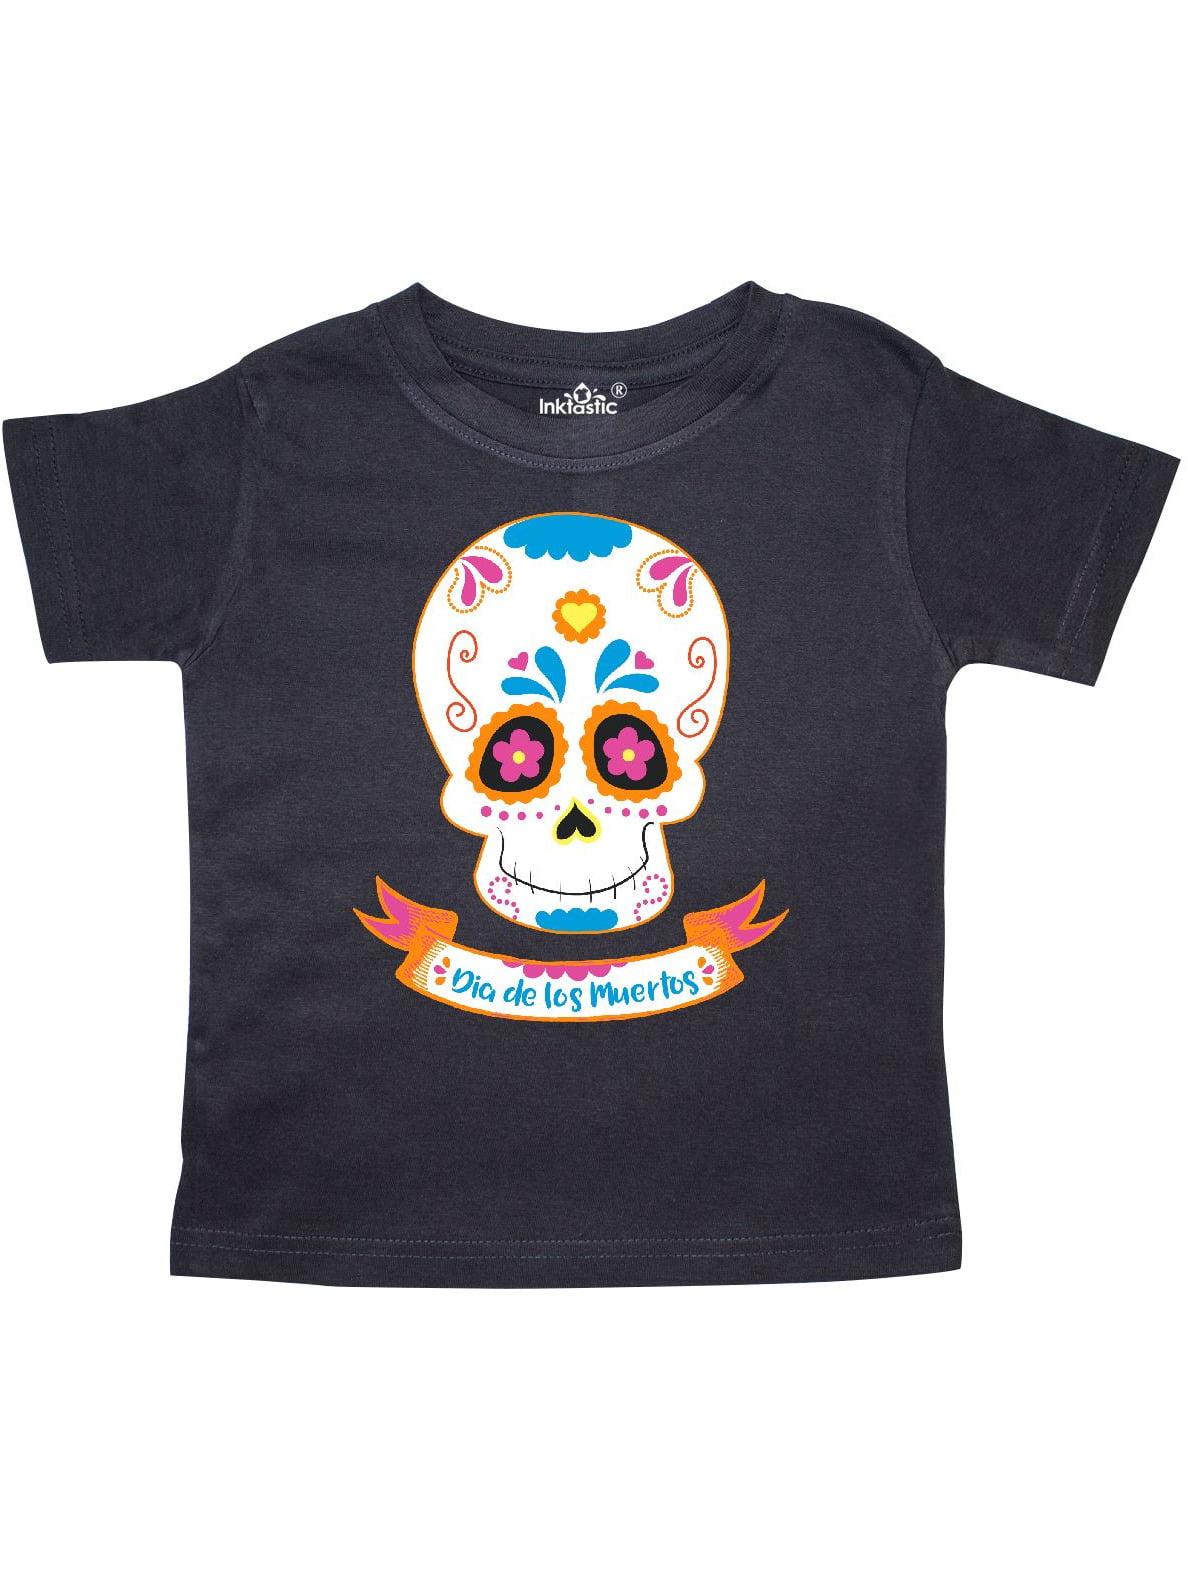 Basketball Logo Pirate Skull Cross Bones Kids Tee Shirt Boys Girls Unisex 2T-XL